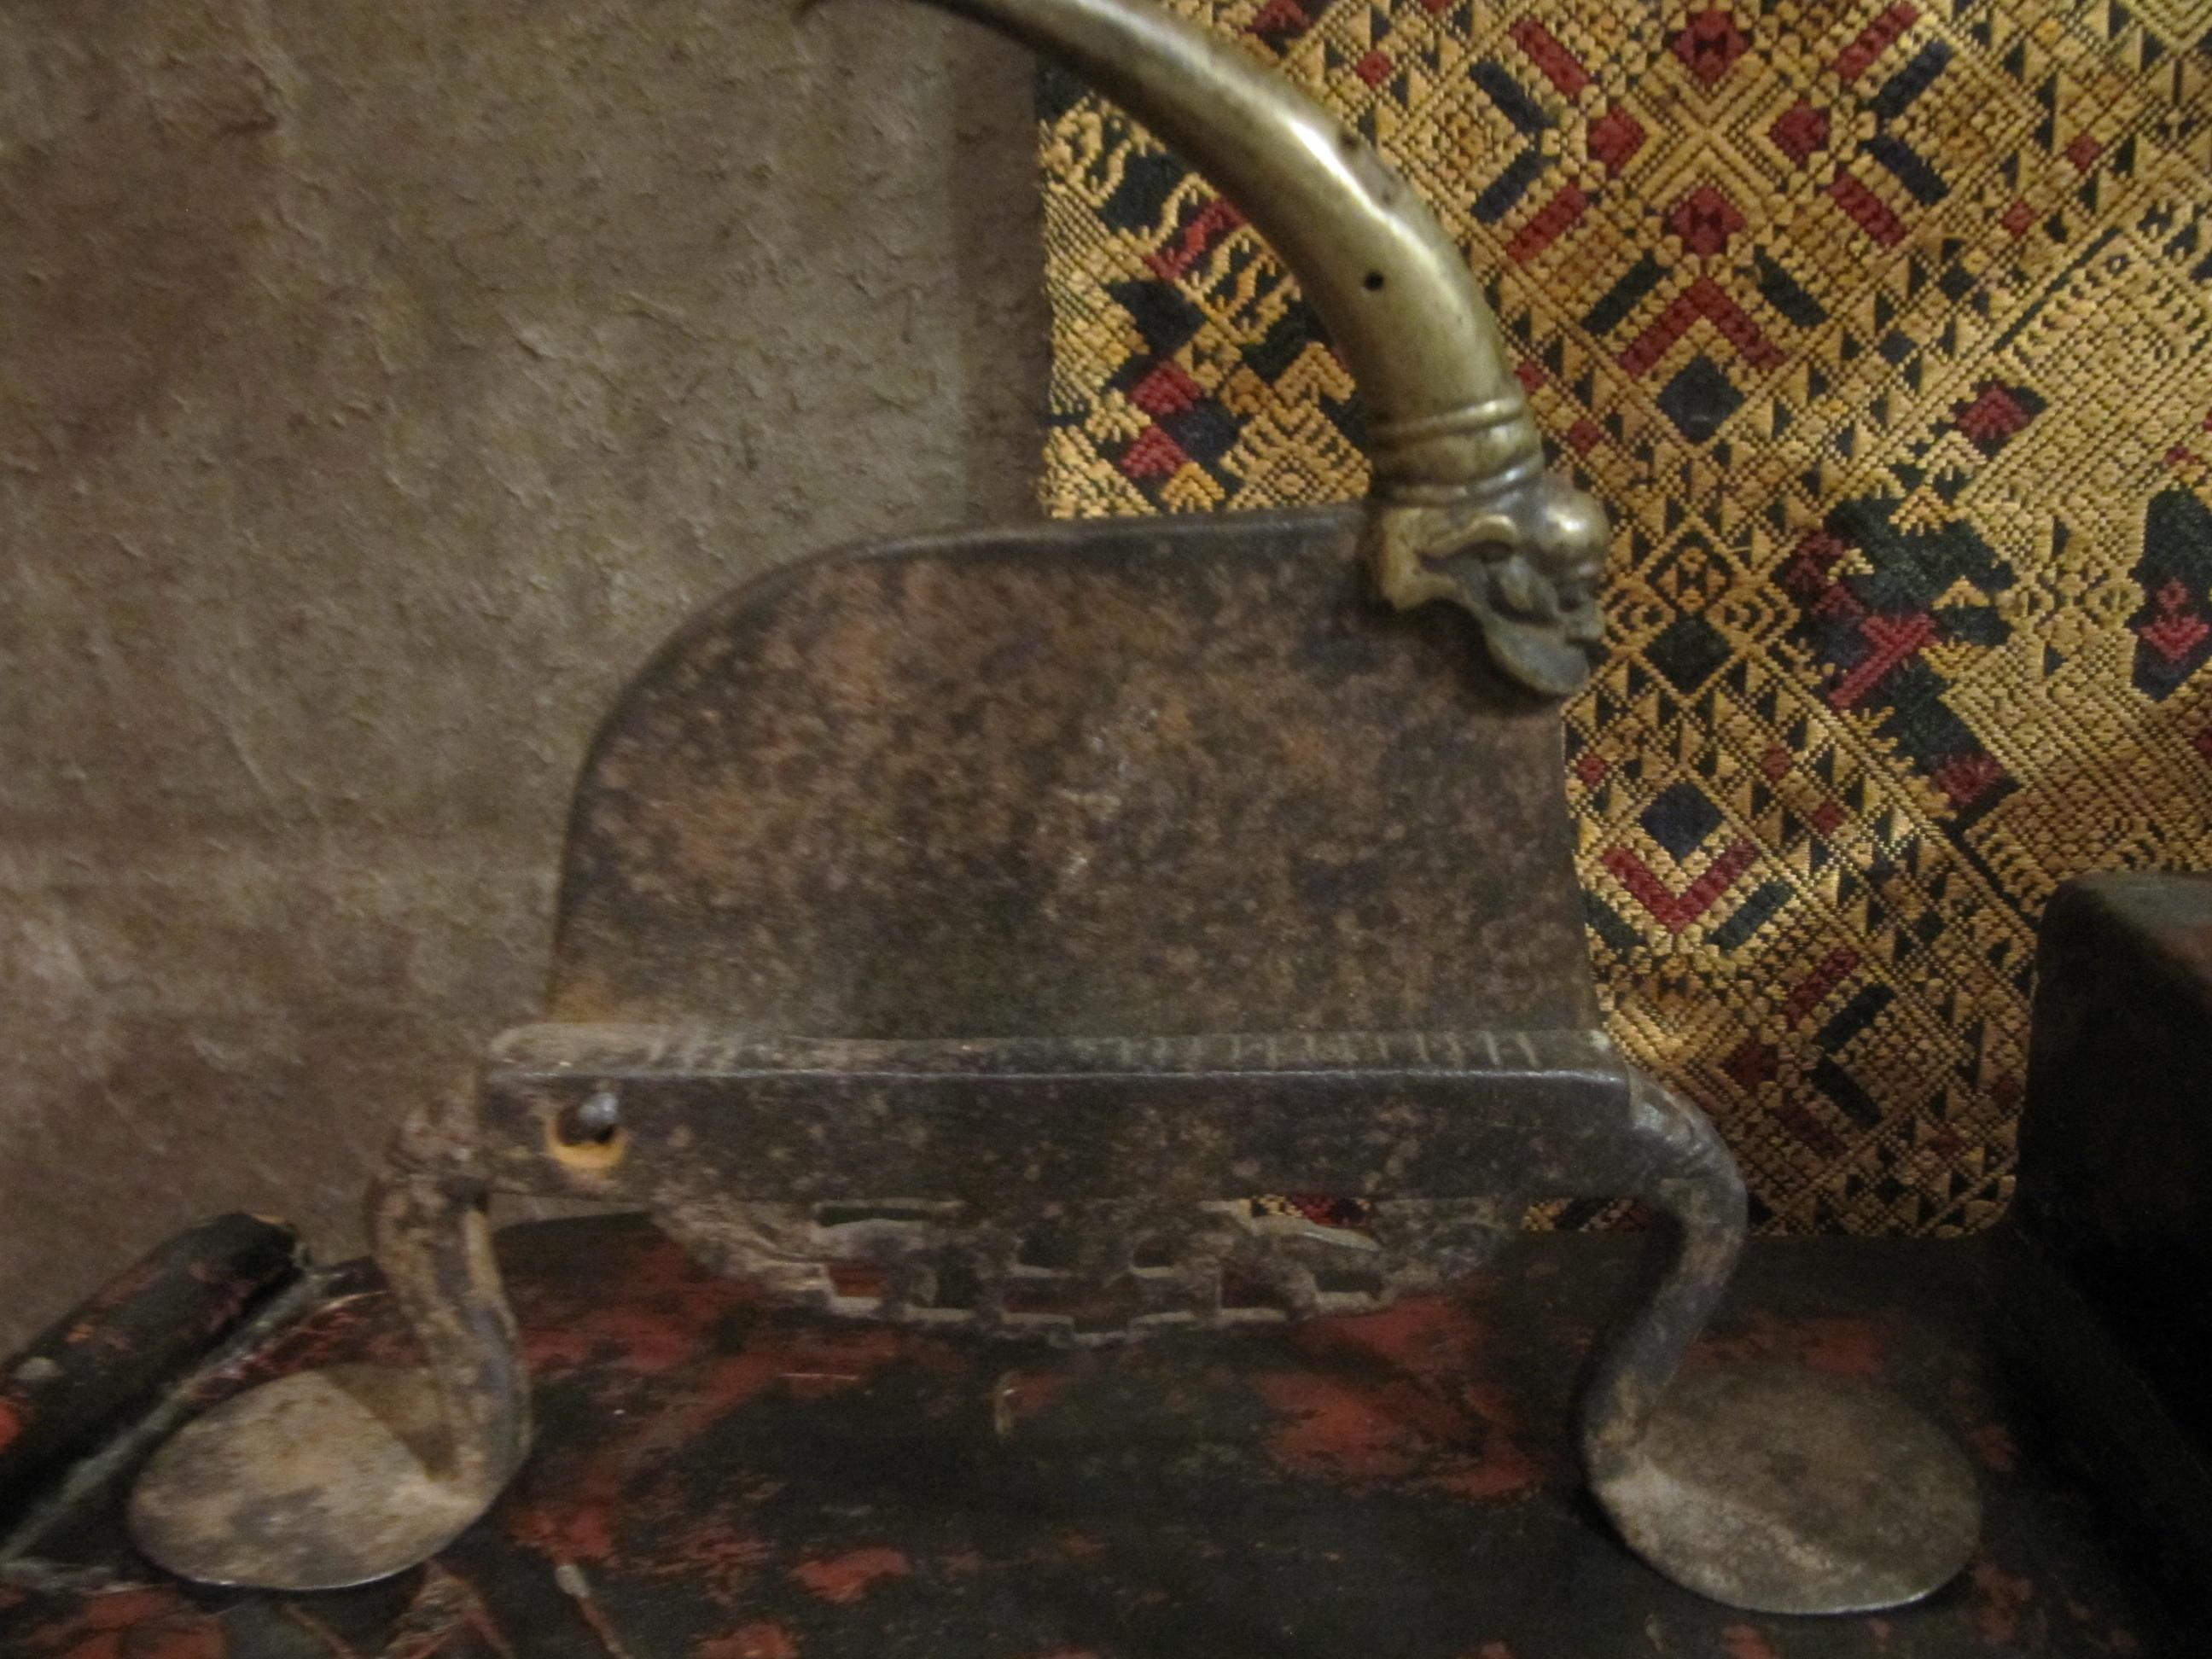 Iron Betel Cutter by    - Masterpiece Online